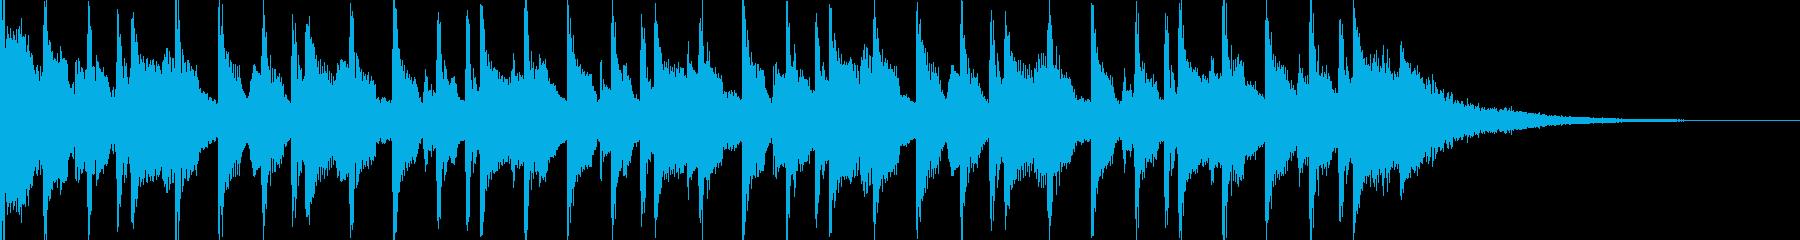 Happy Ukulele 7の再生済みの波形